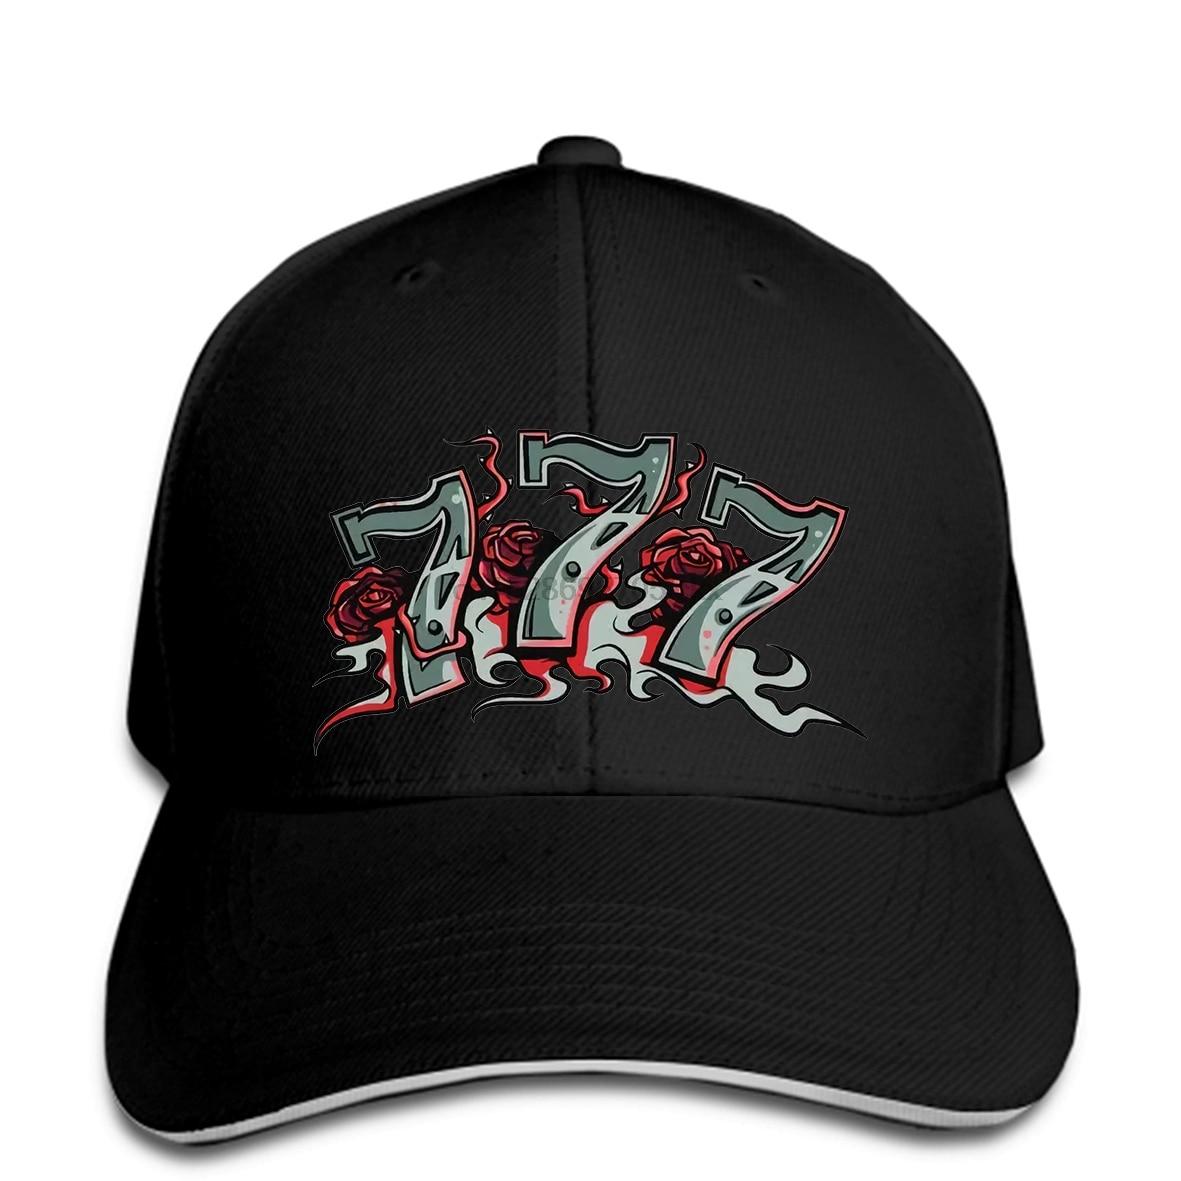 Crazy Casino Los Vegas Jackpot Lucky No. 777 Roses Gambling Mens White Baseball Cap Snapback Hat Peaked